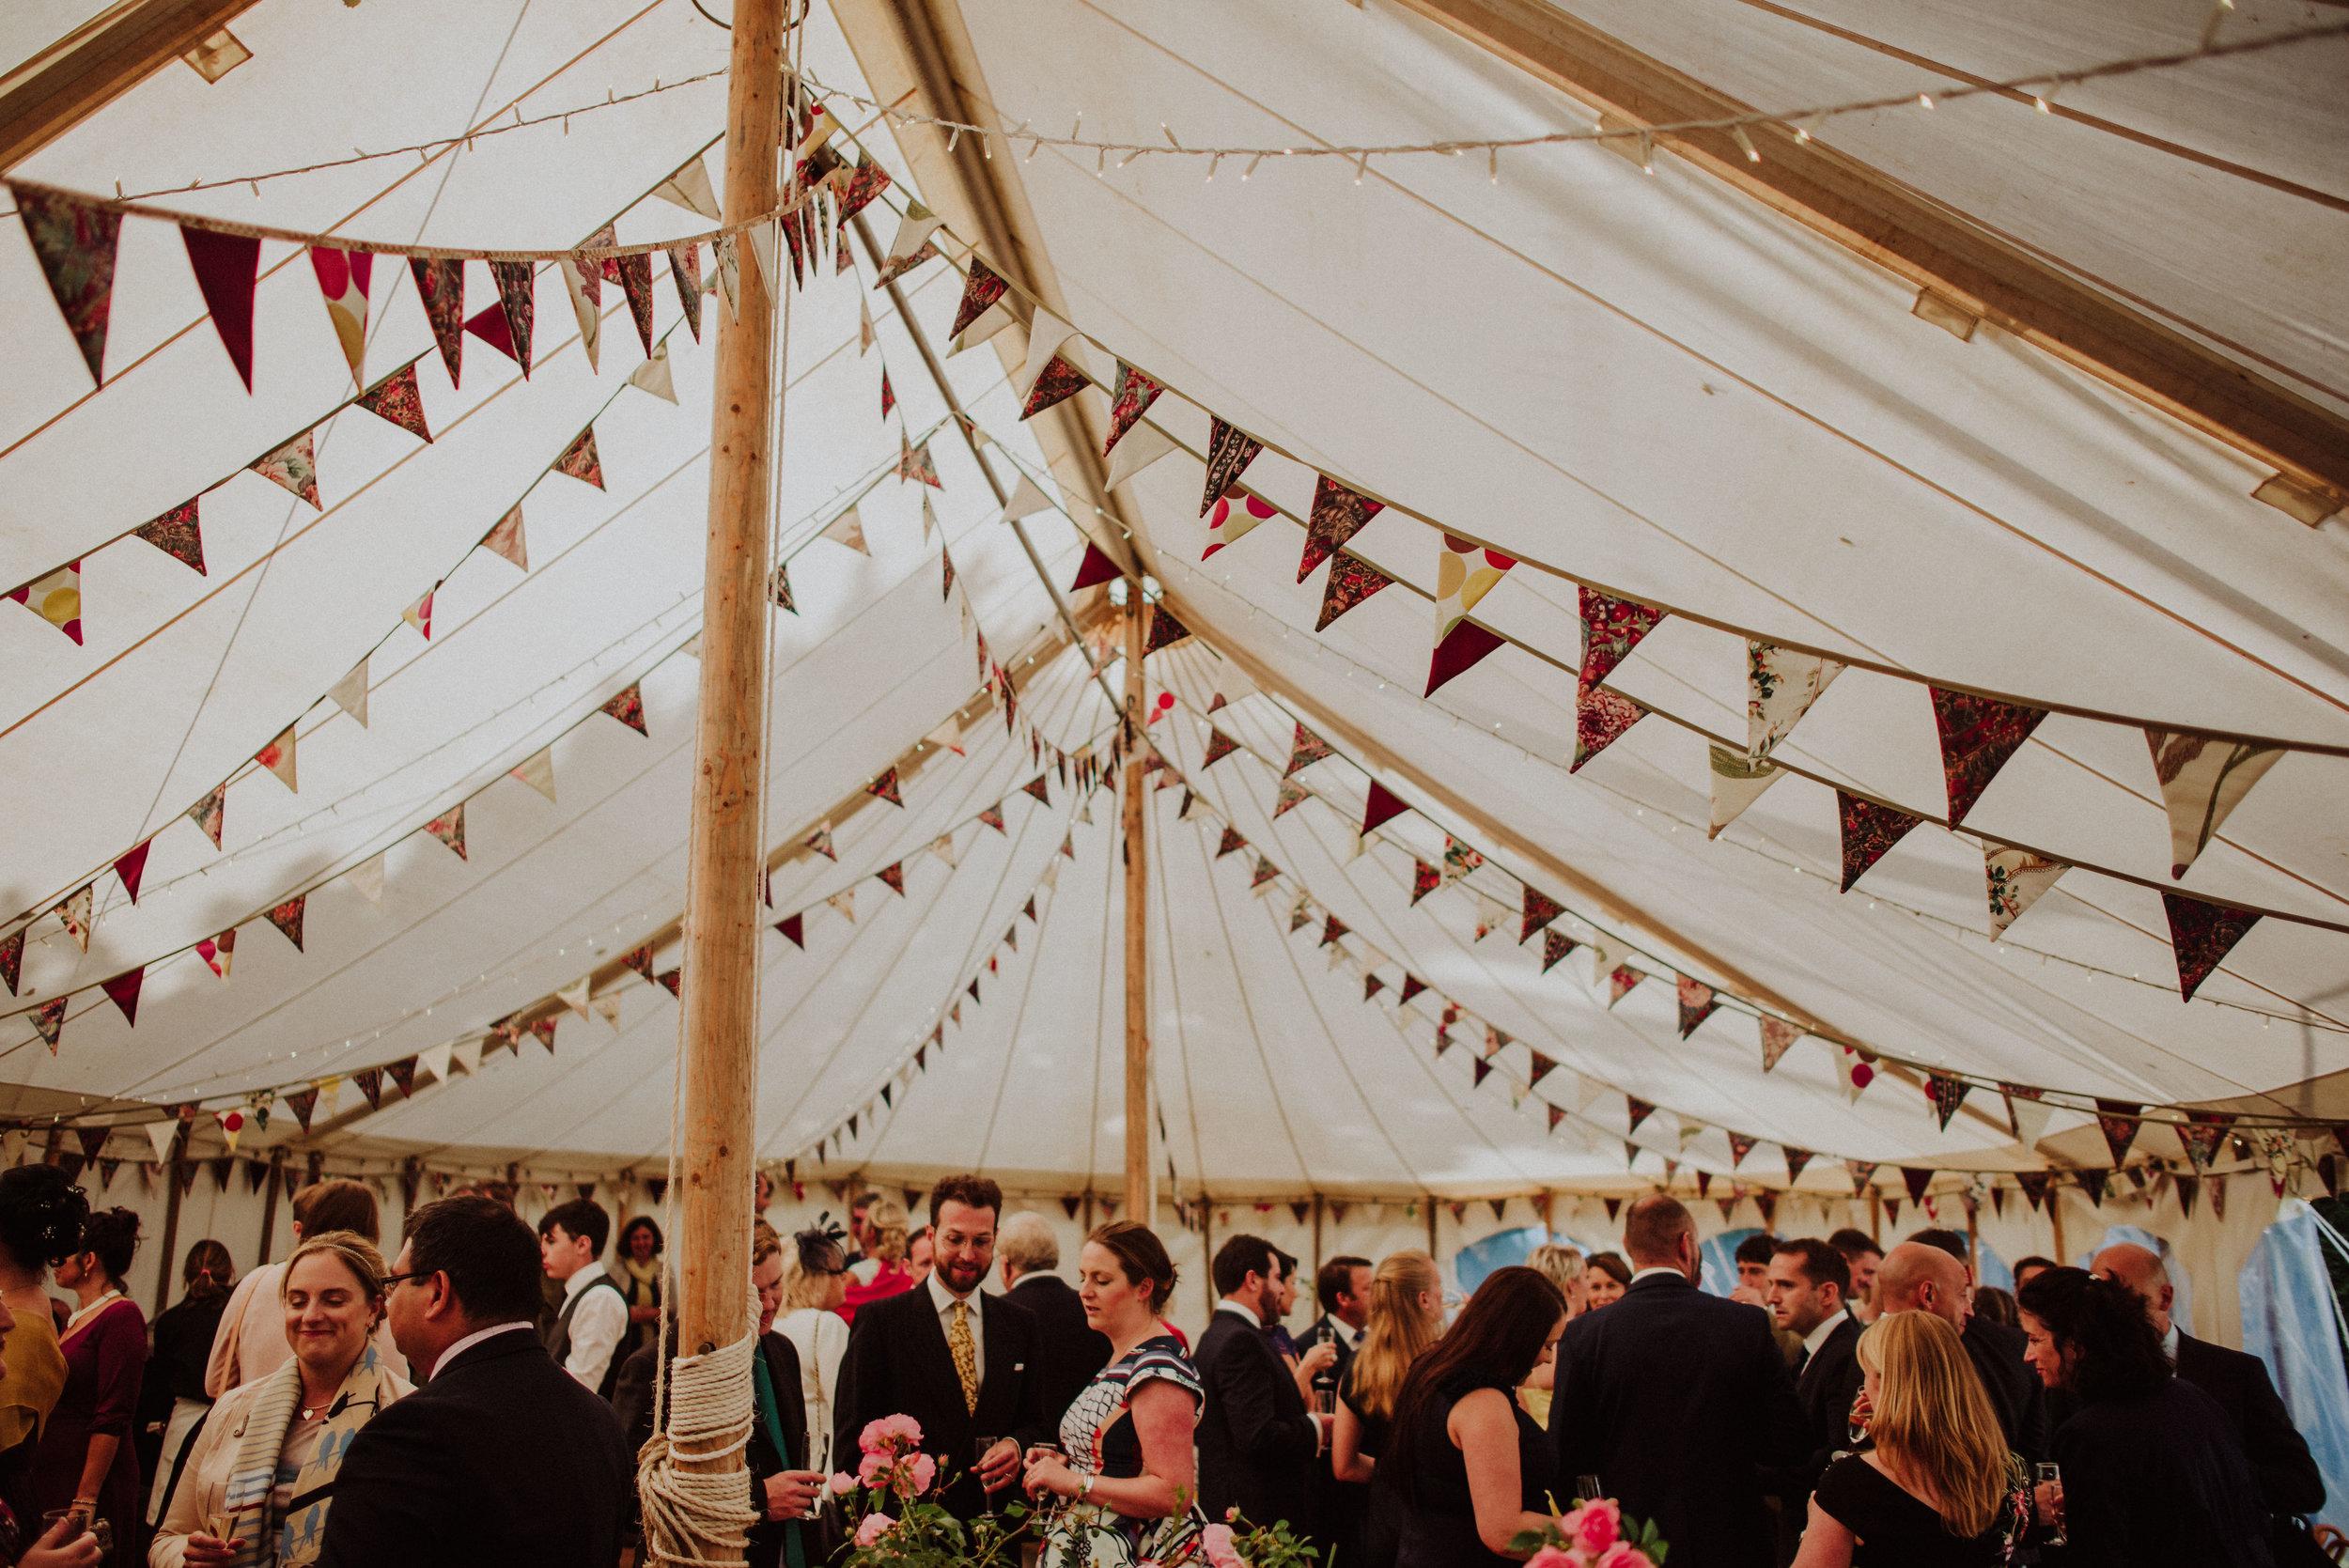 port-eliot-wedding-photographer-40.jpg